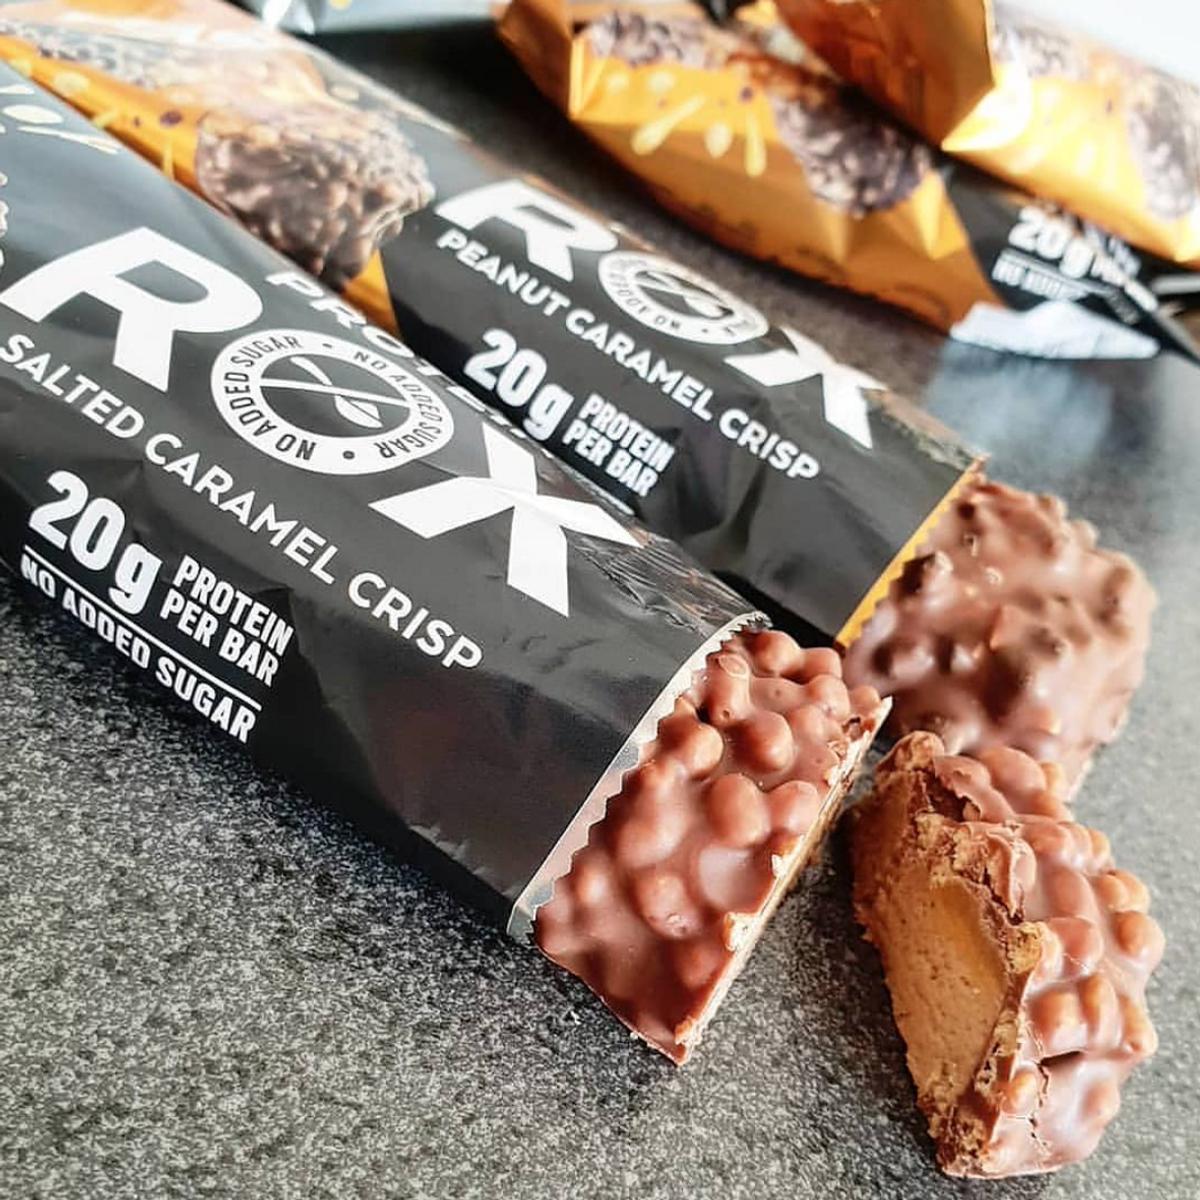 FAST - Rox Proteinbar - Salted Caramel Choco Crisp 55g